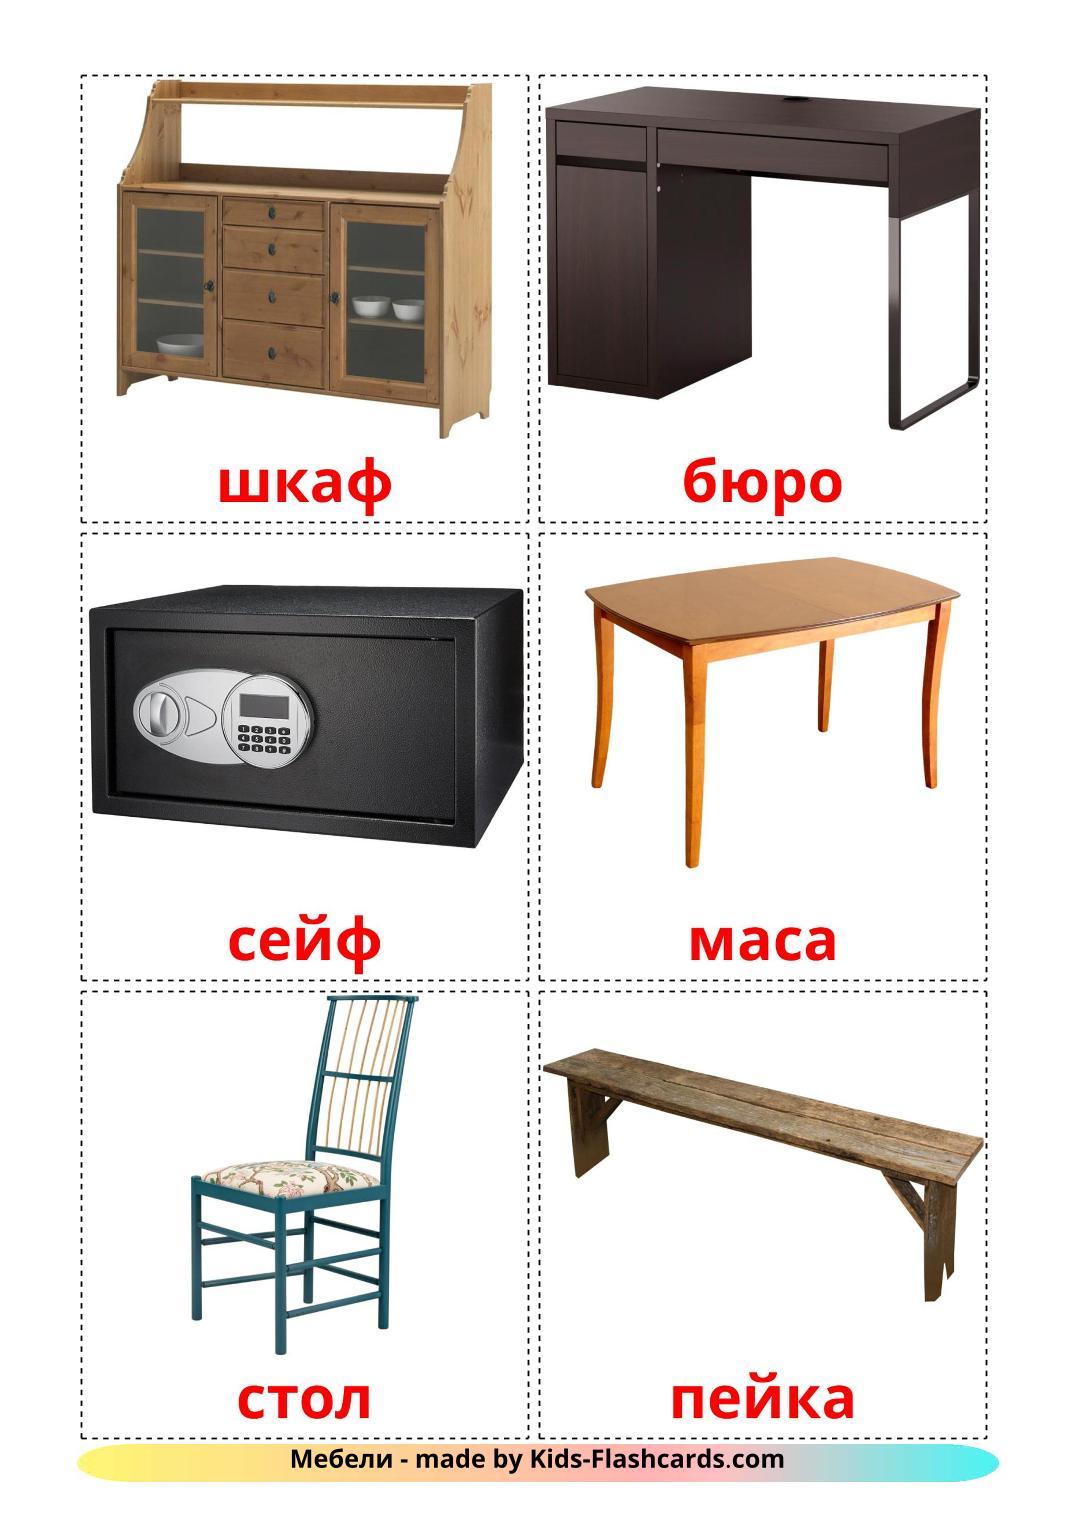 Furniture - 31 Free Printable bulgarian Flashcards